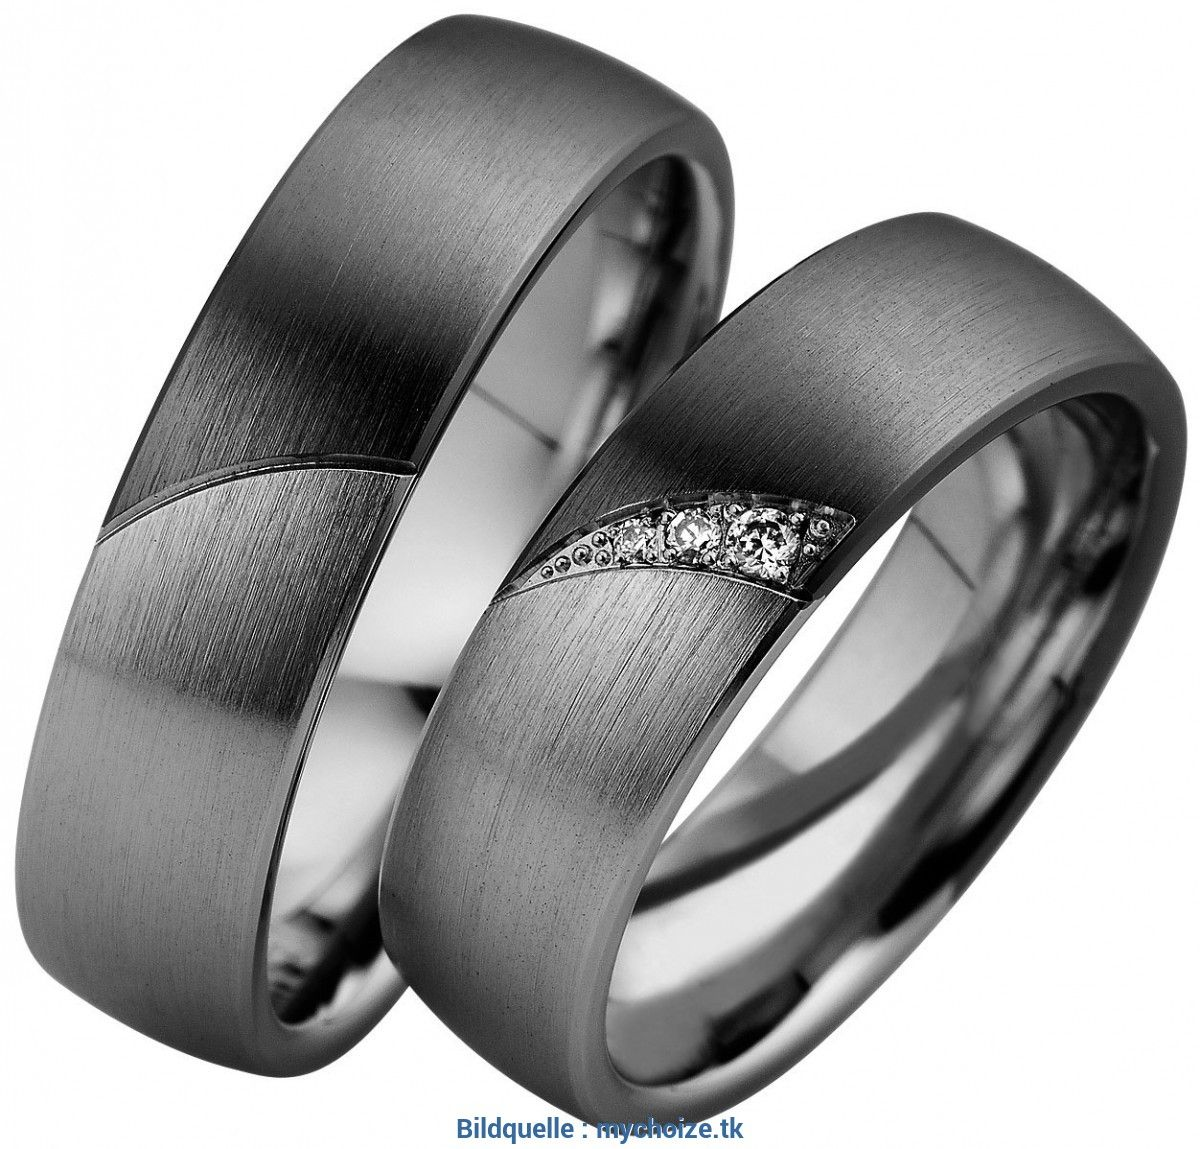 Bonitos anillos de boda baratos Hamburgo 100+ [ Hochzeitsringe Titan Schwarz ] | Traurin …